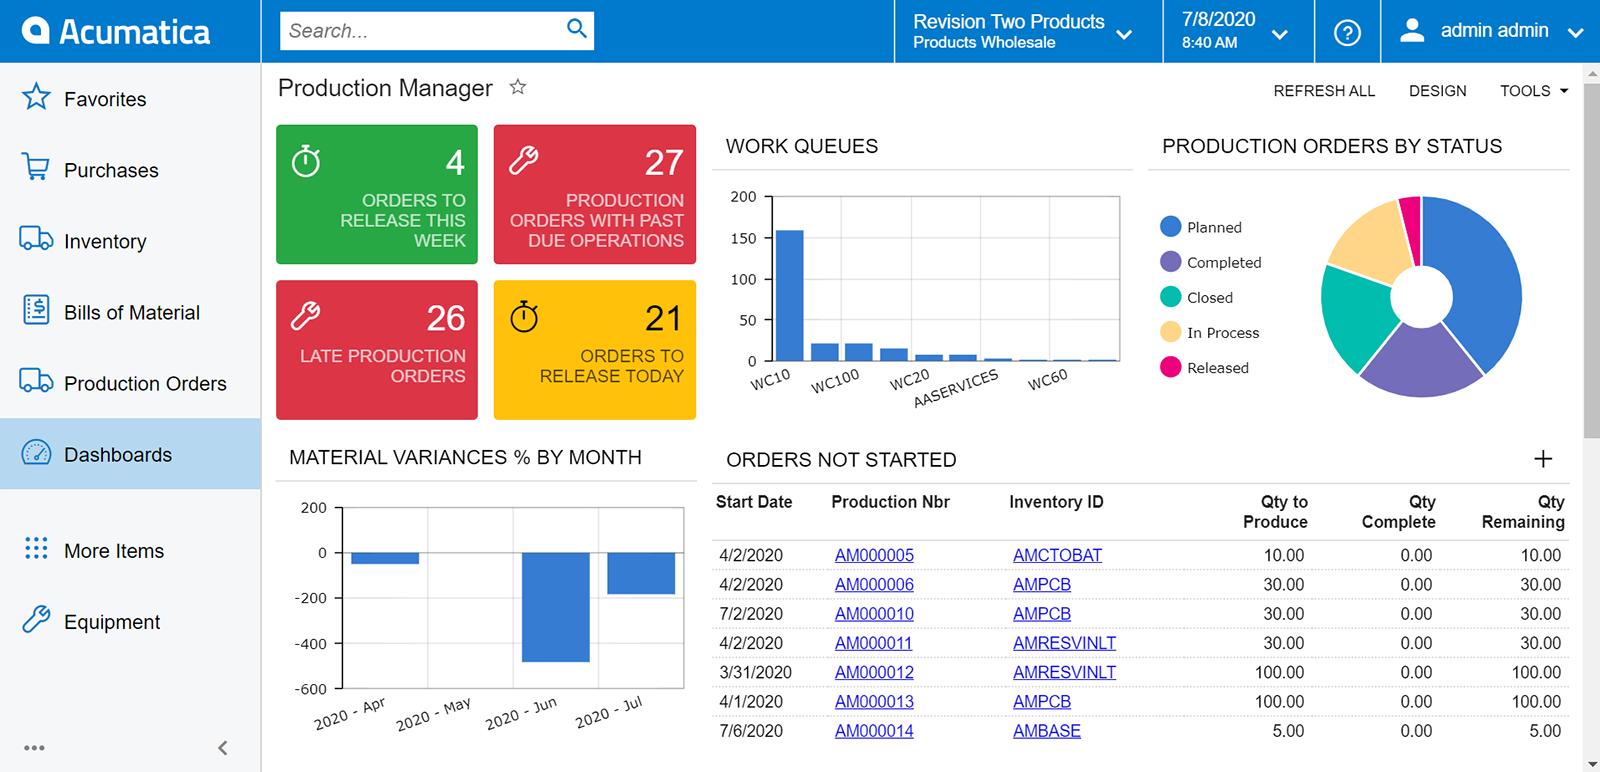 Acumatica Cloud ERP Software - 1